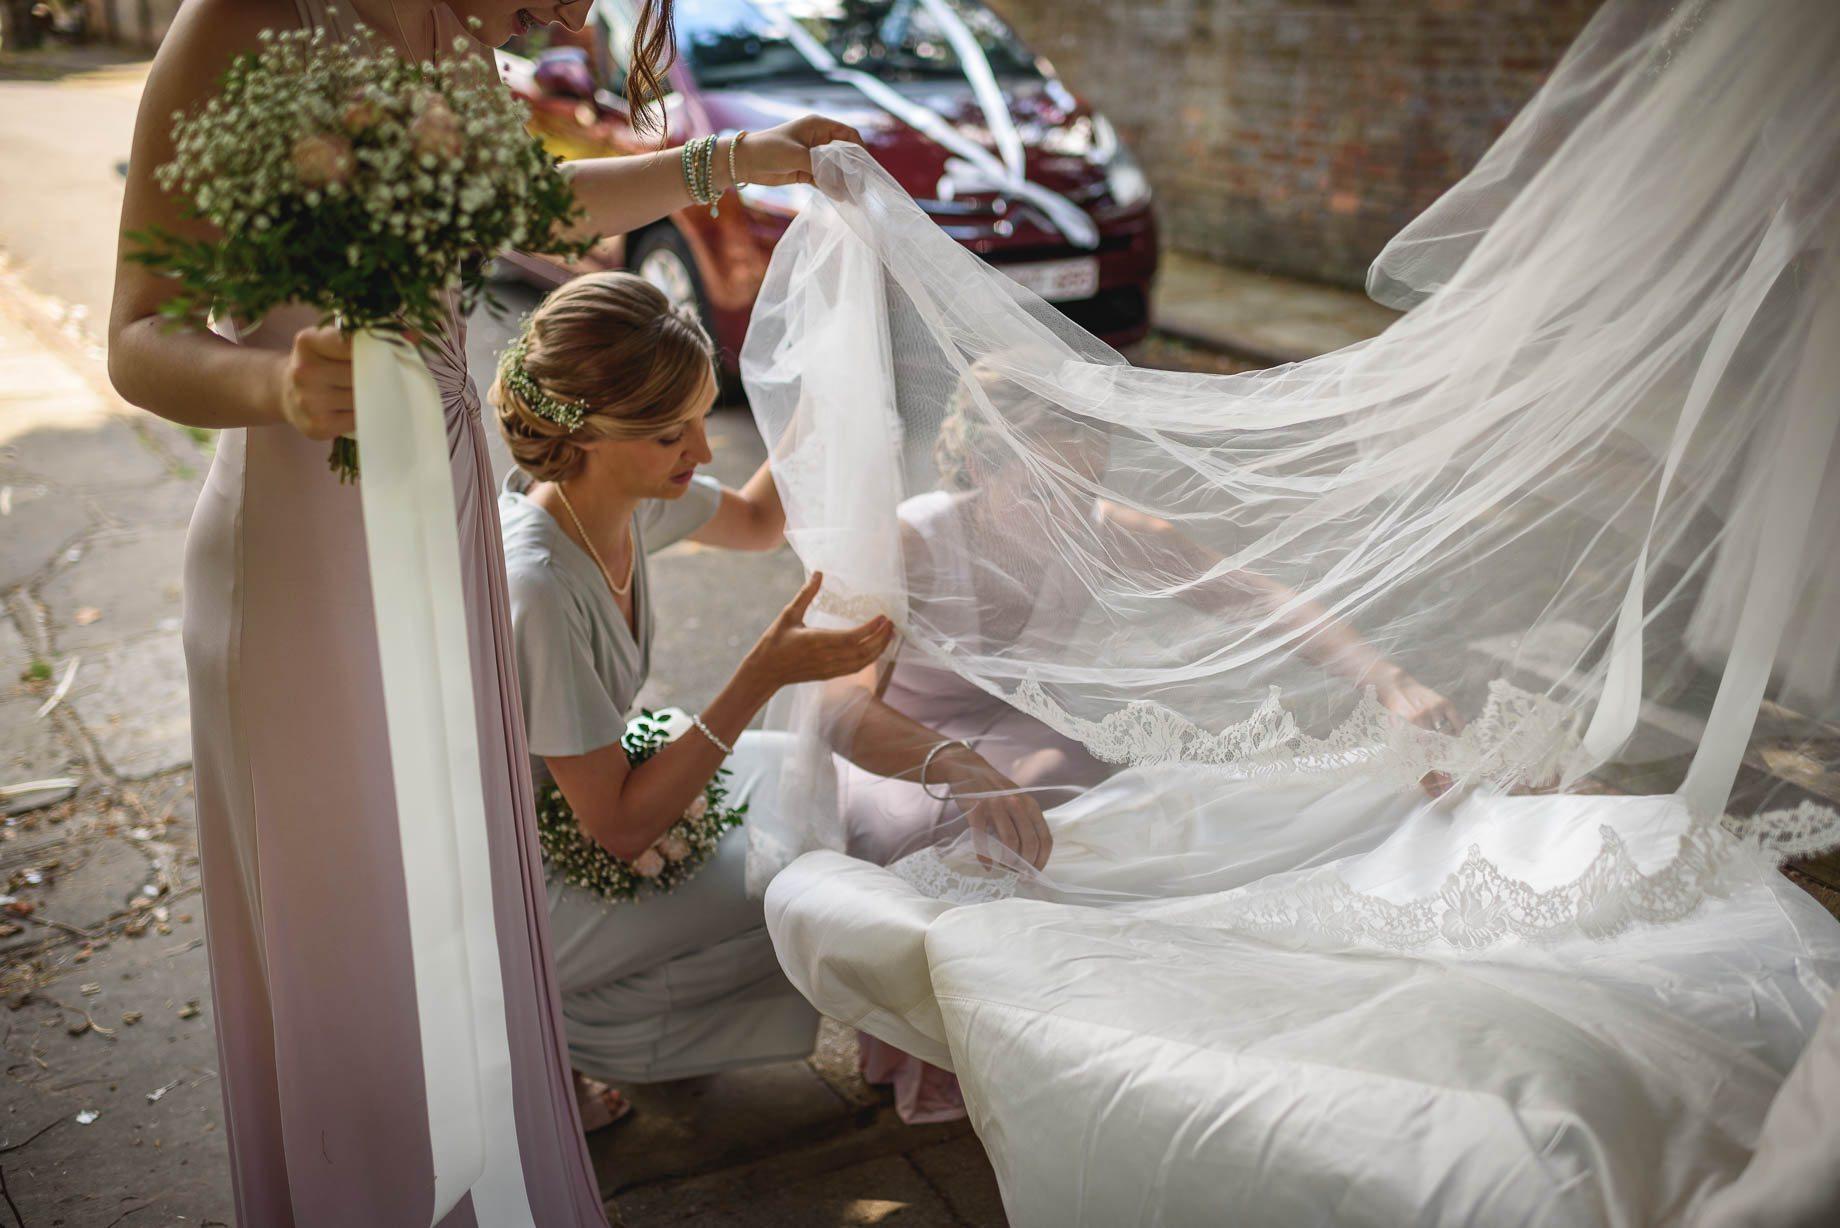 Gildings Barn wedding photography - Sarah and Steve (39 of 190)